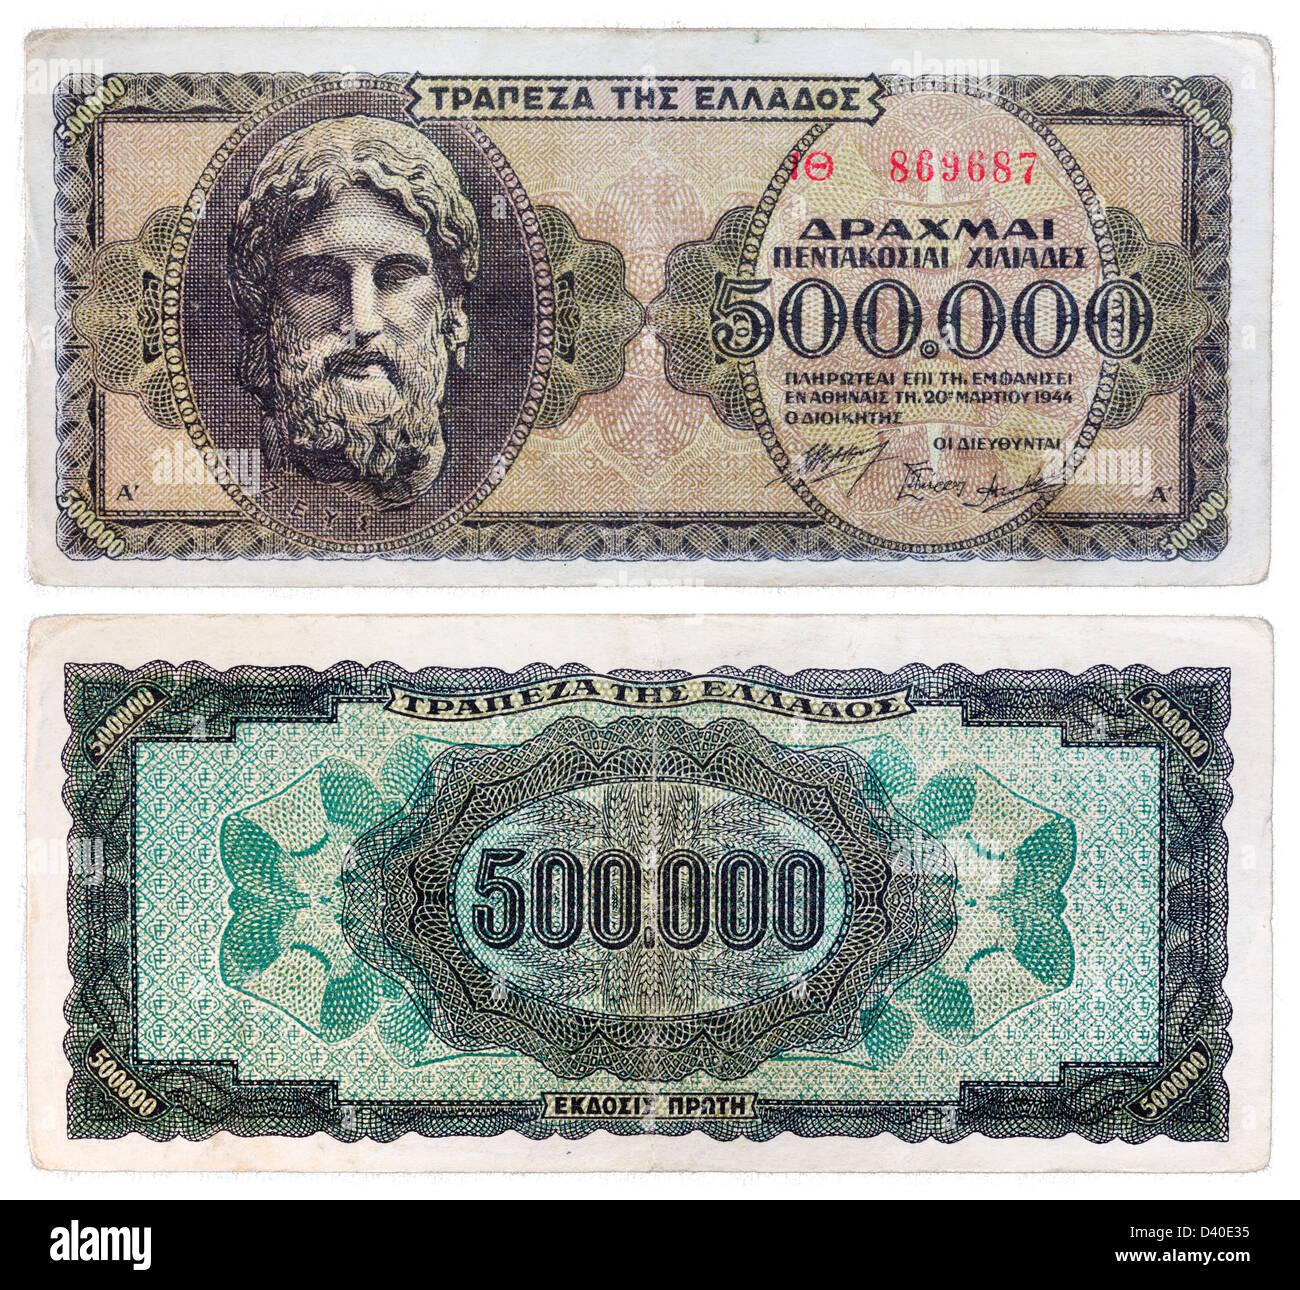 500000 Drachmas banknote, Head of Zeus, Greece, 1944 - Stock Image